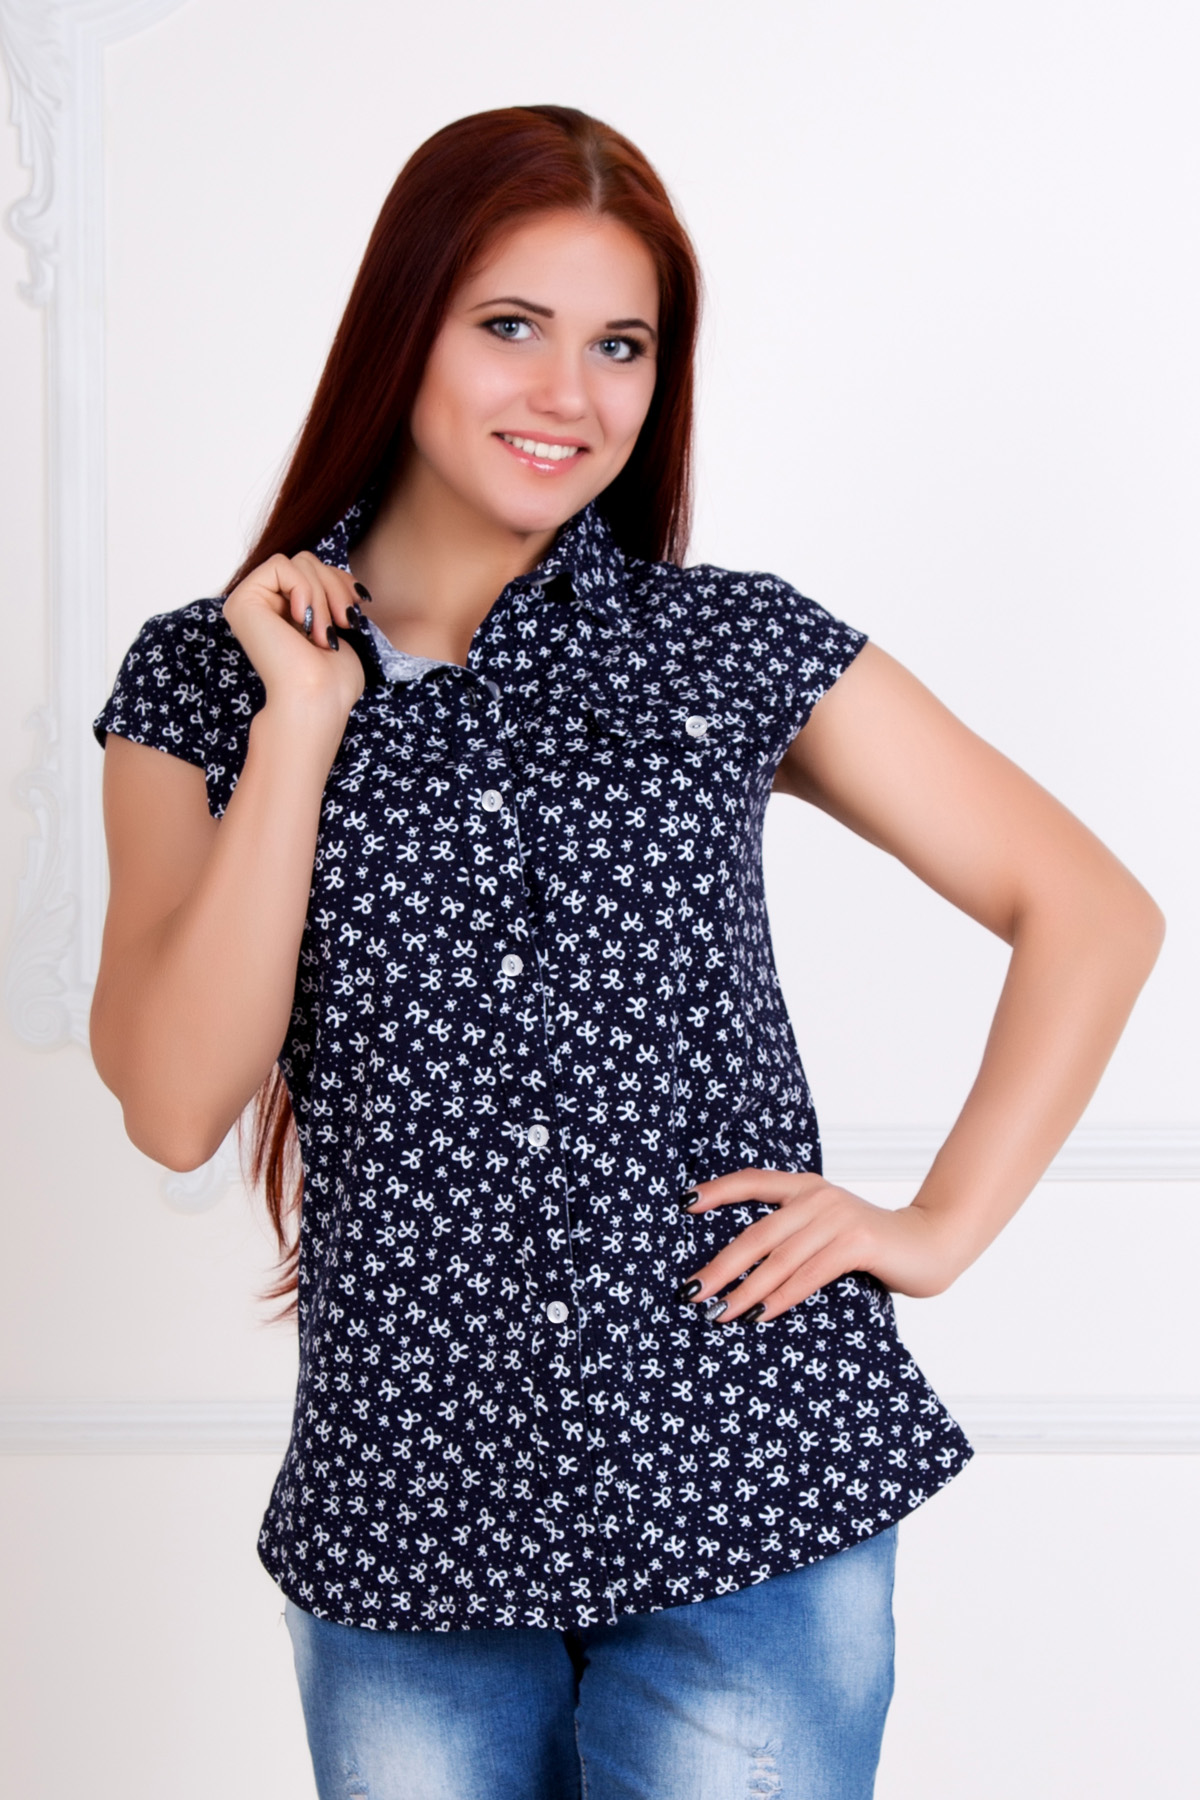 Жен. рубашка Летняя р. 54Блузки, майки, кофты<br>Обхват груди:108 см<br>Обхват талии:88 см<br>Обхват бедер:116 см<br>Длина по спинке:71 см<br>Рост:167 см<br><br>Тип: Жен. рубашка<br>Размер: 54<br>Материал: Кулирка